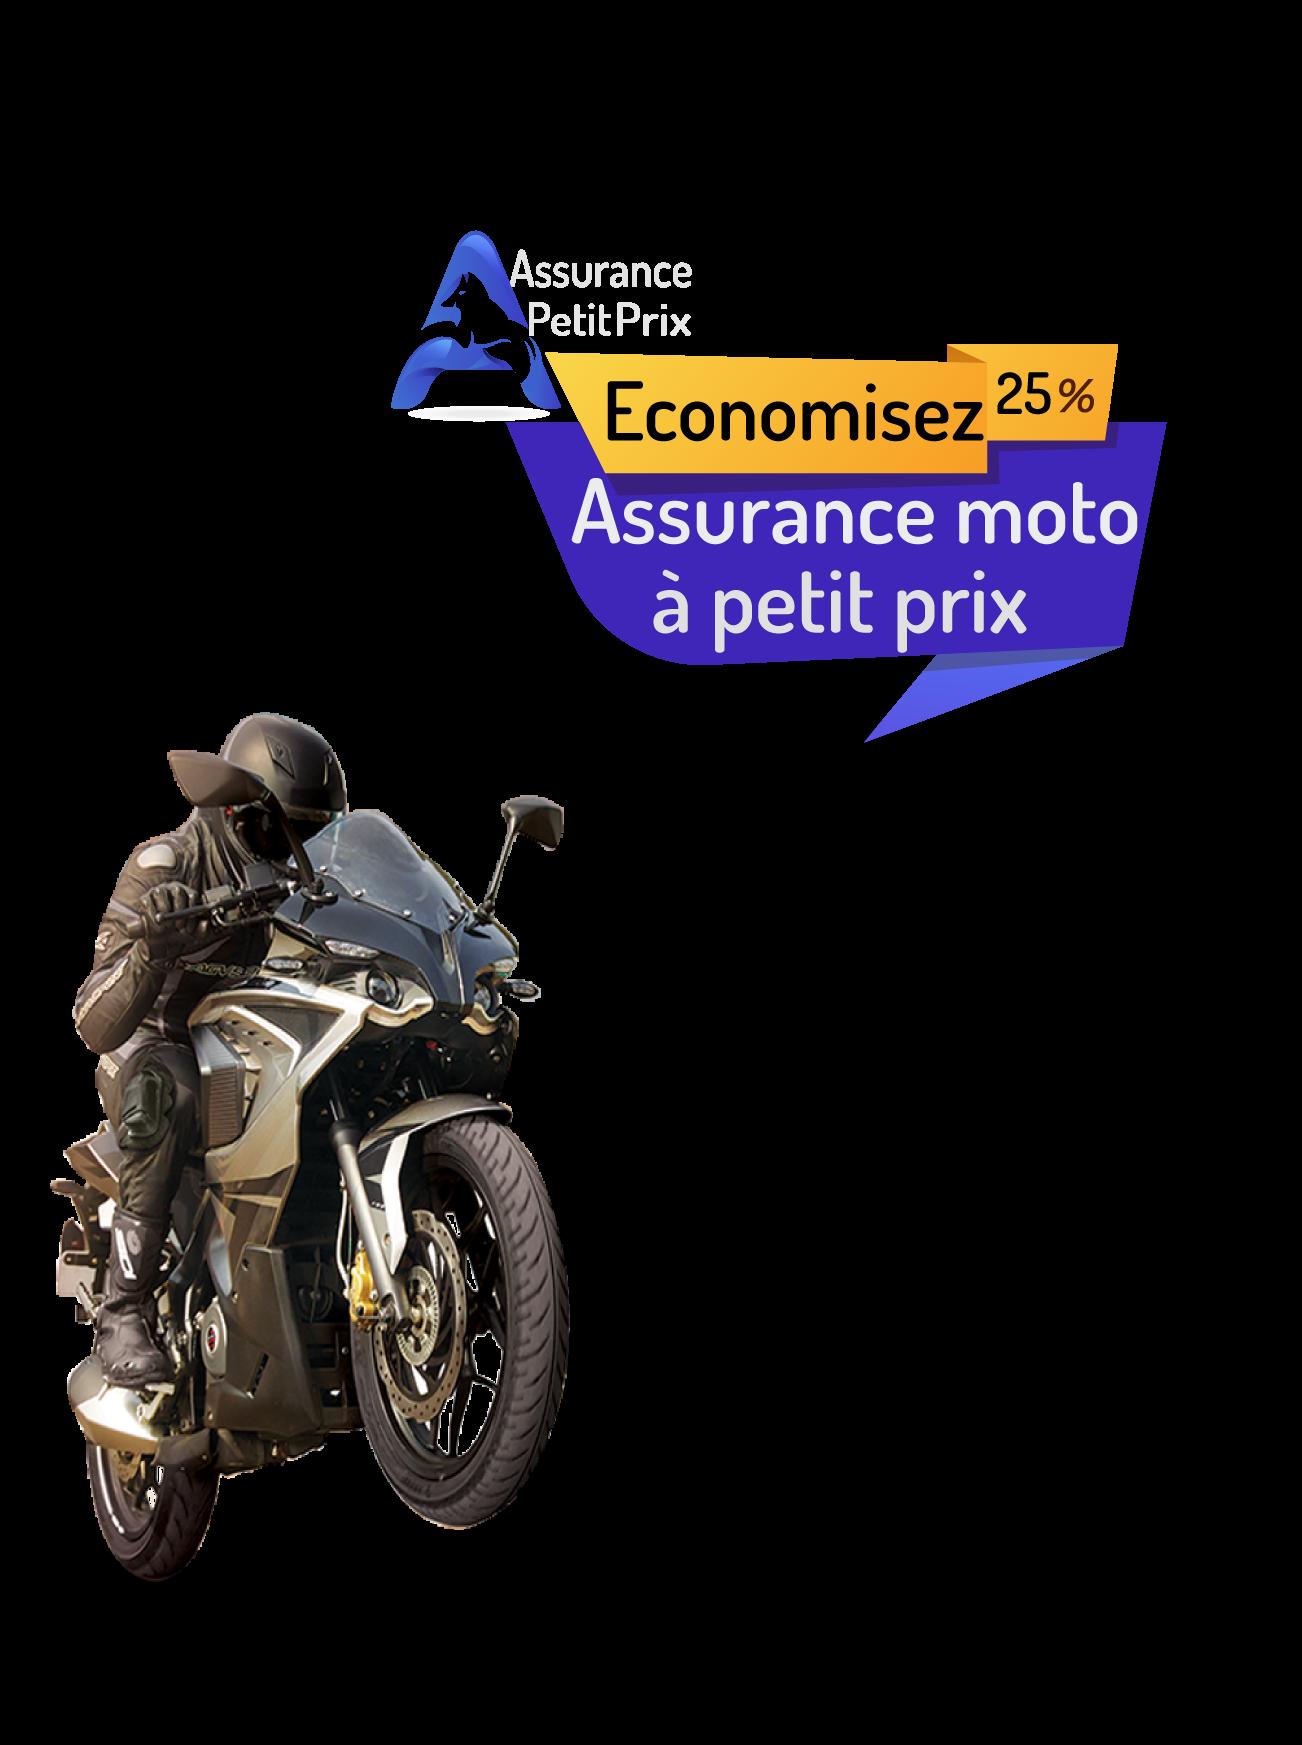 Assurance moto petit prix